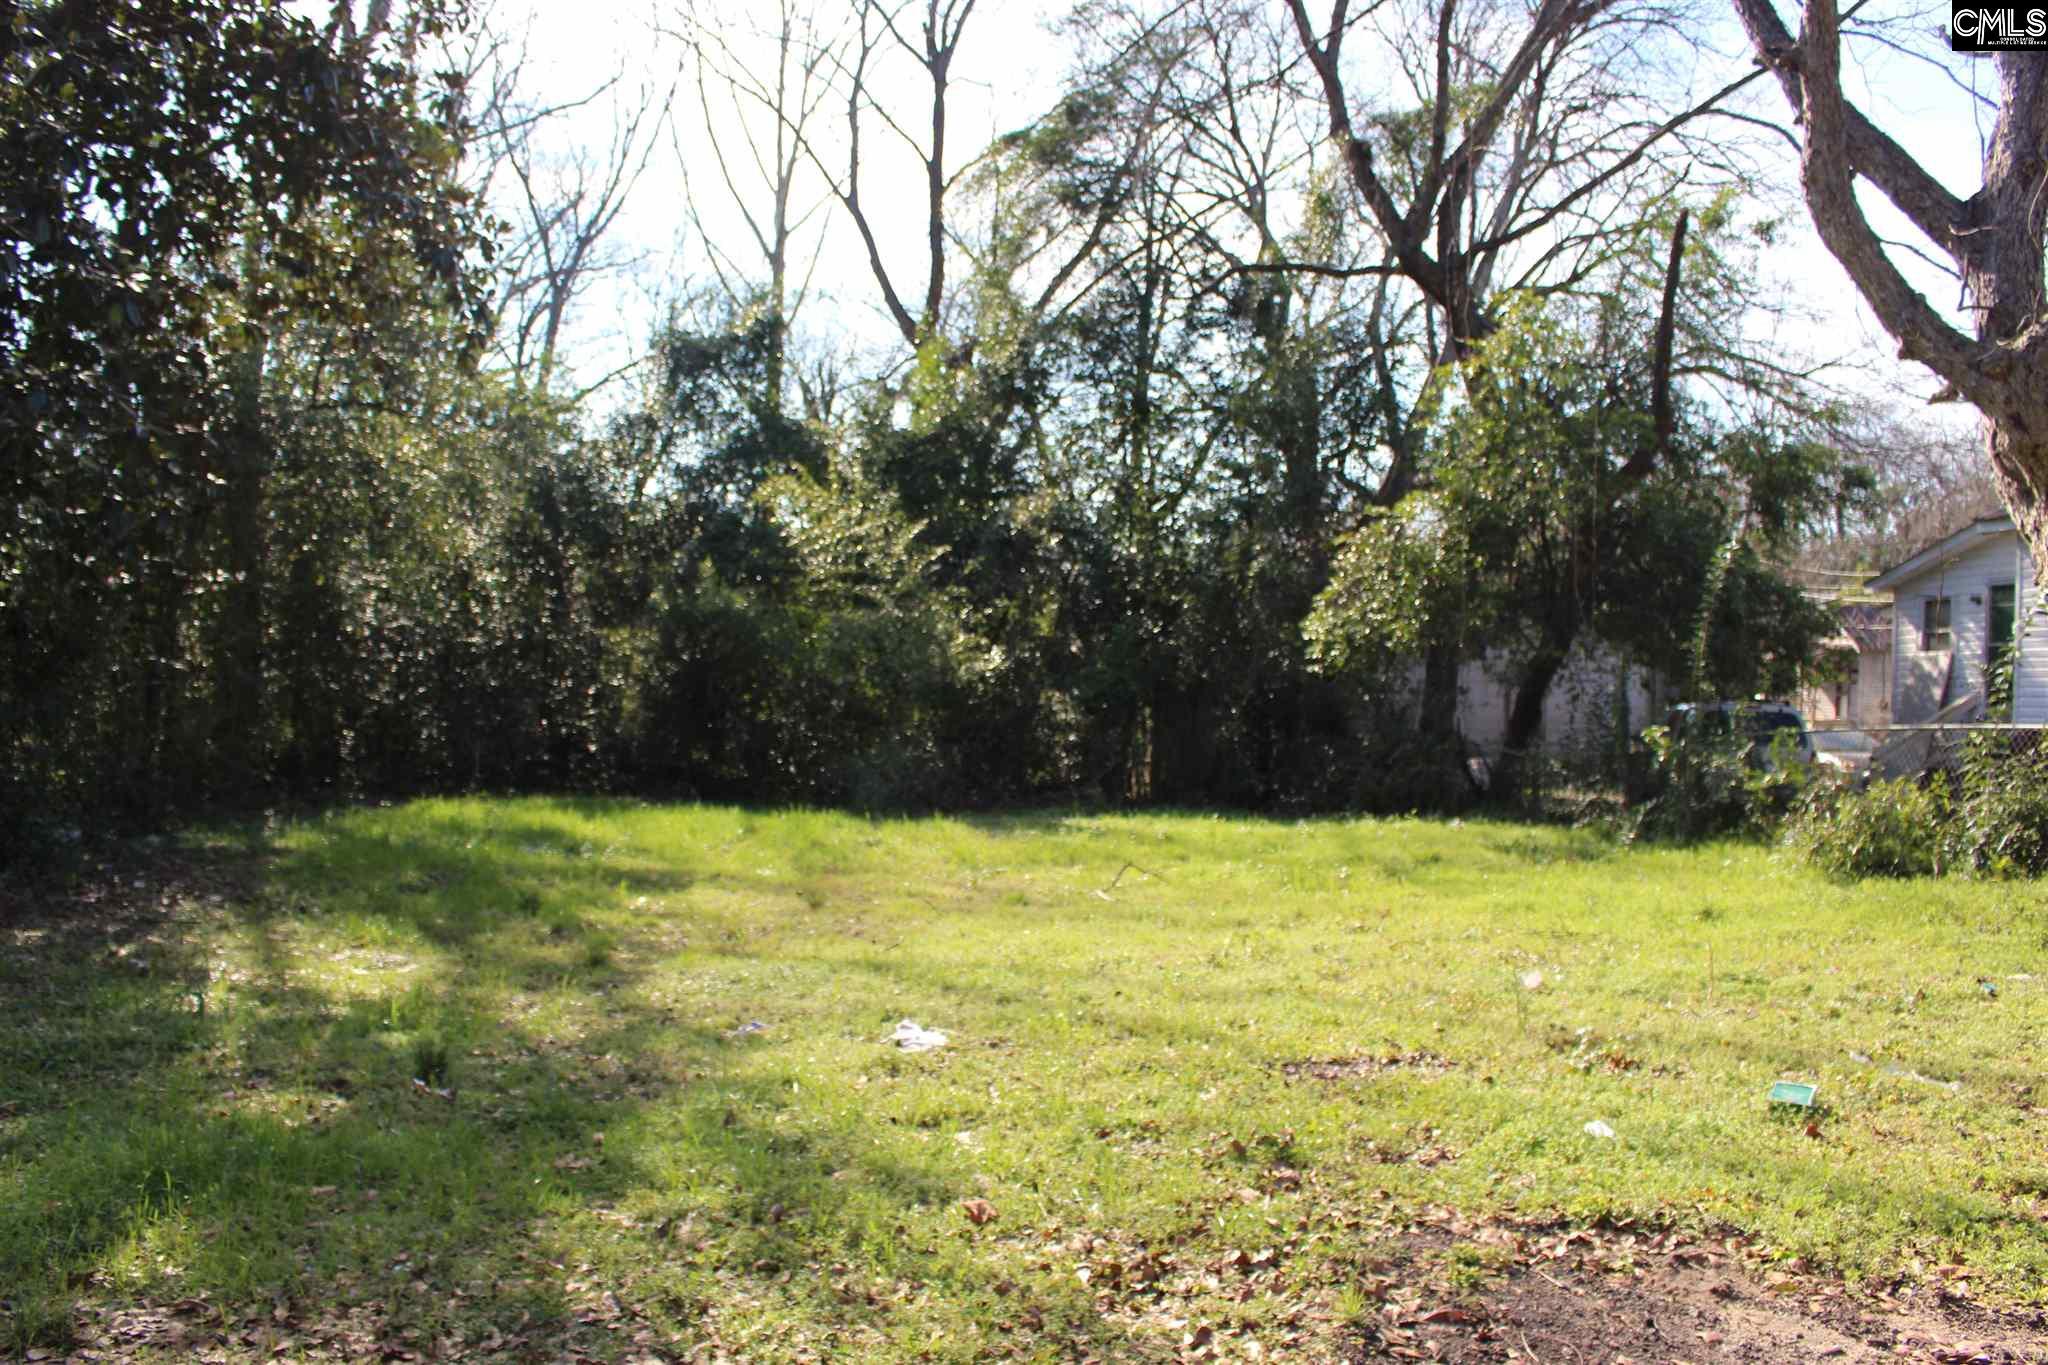 485 Sunnyside Orangeburg, SC 29116